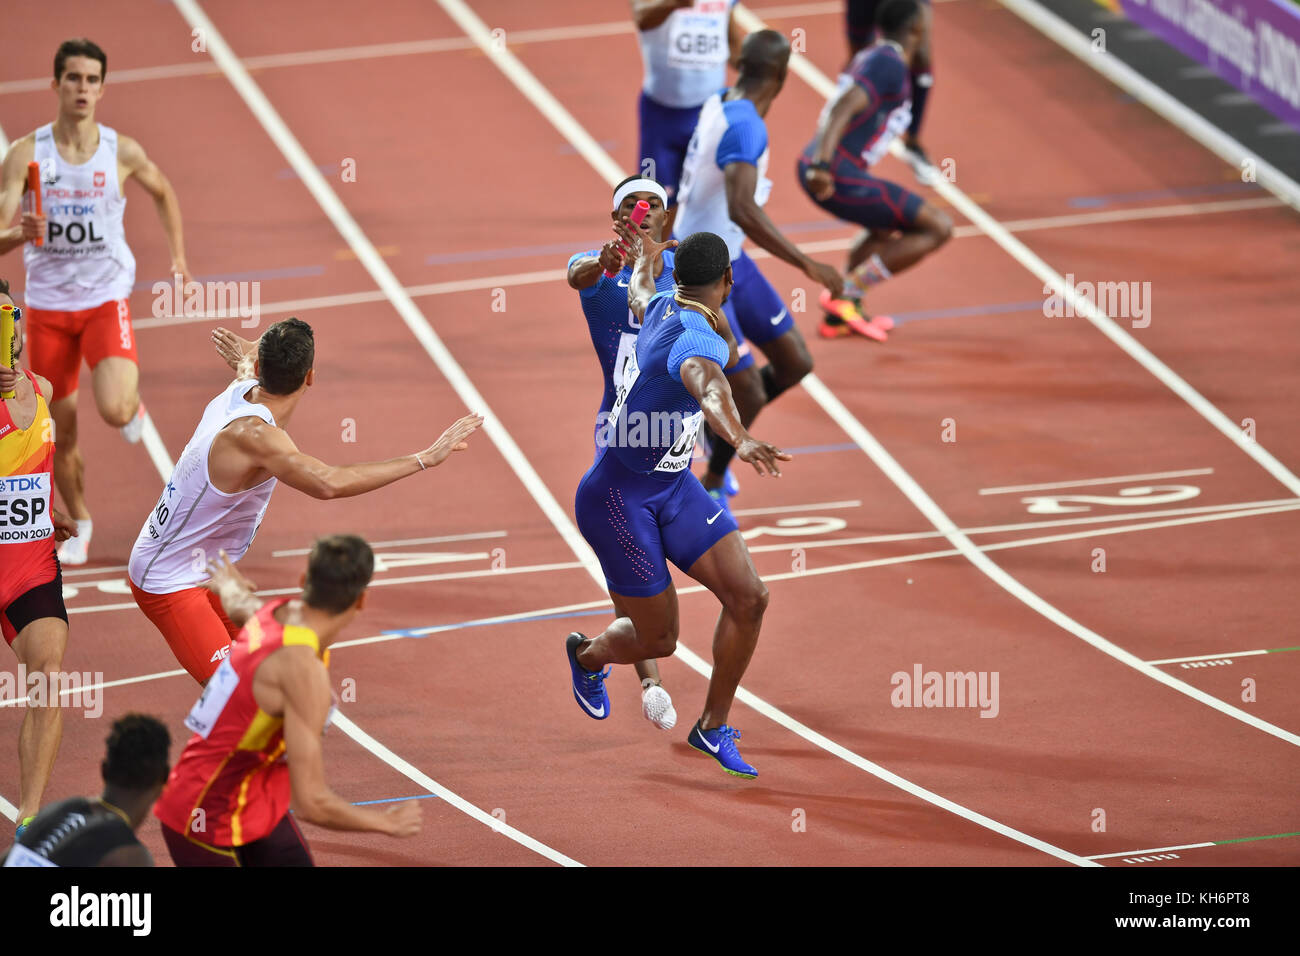 USA Team - 4x400 Men's relays - IAAF World Championships - London 2017 - Stock Image